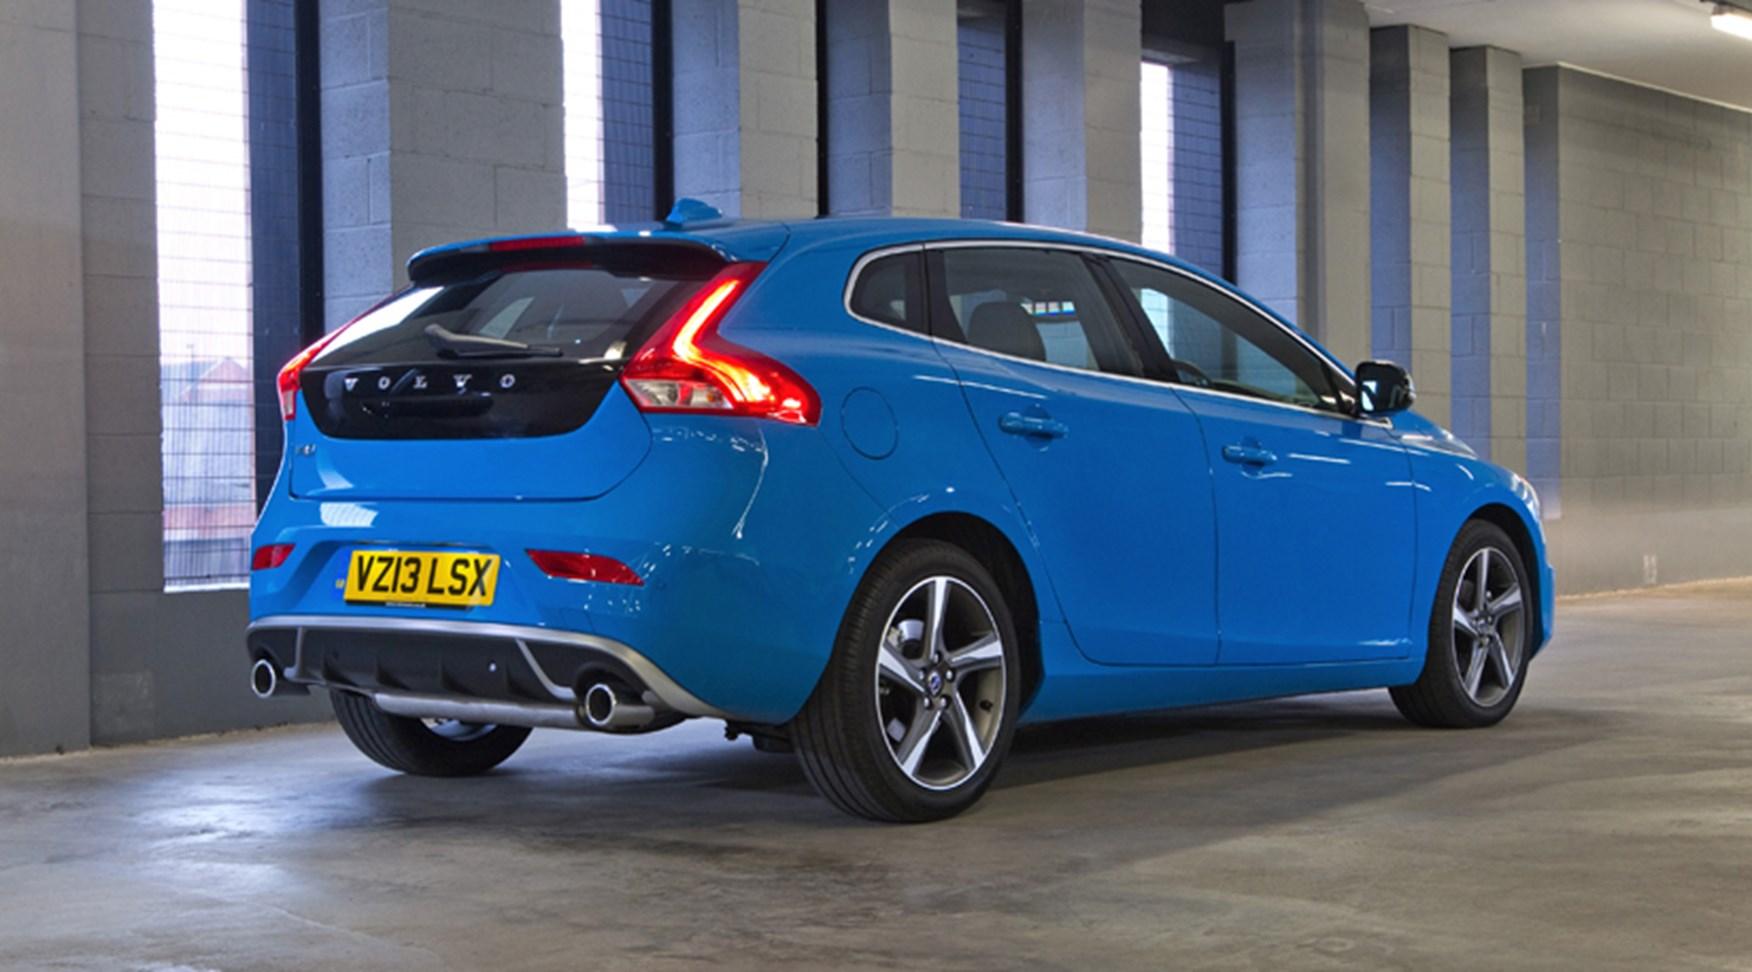 Volvo V40 R Design 2013 Review By Car Magazine